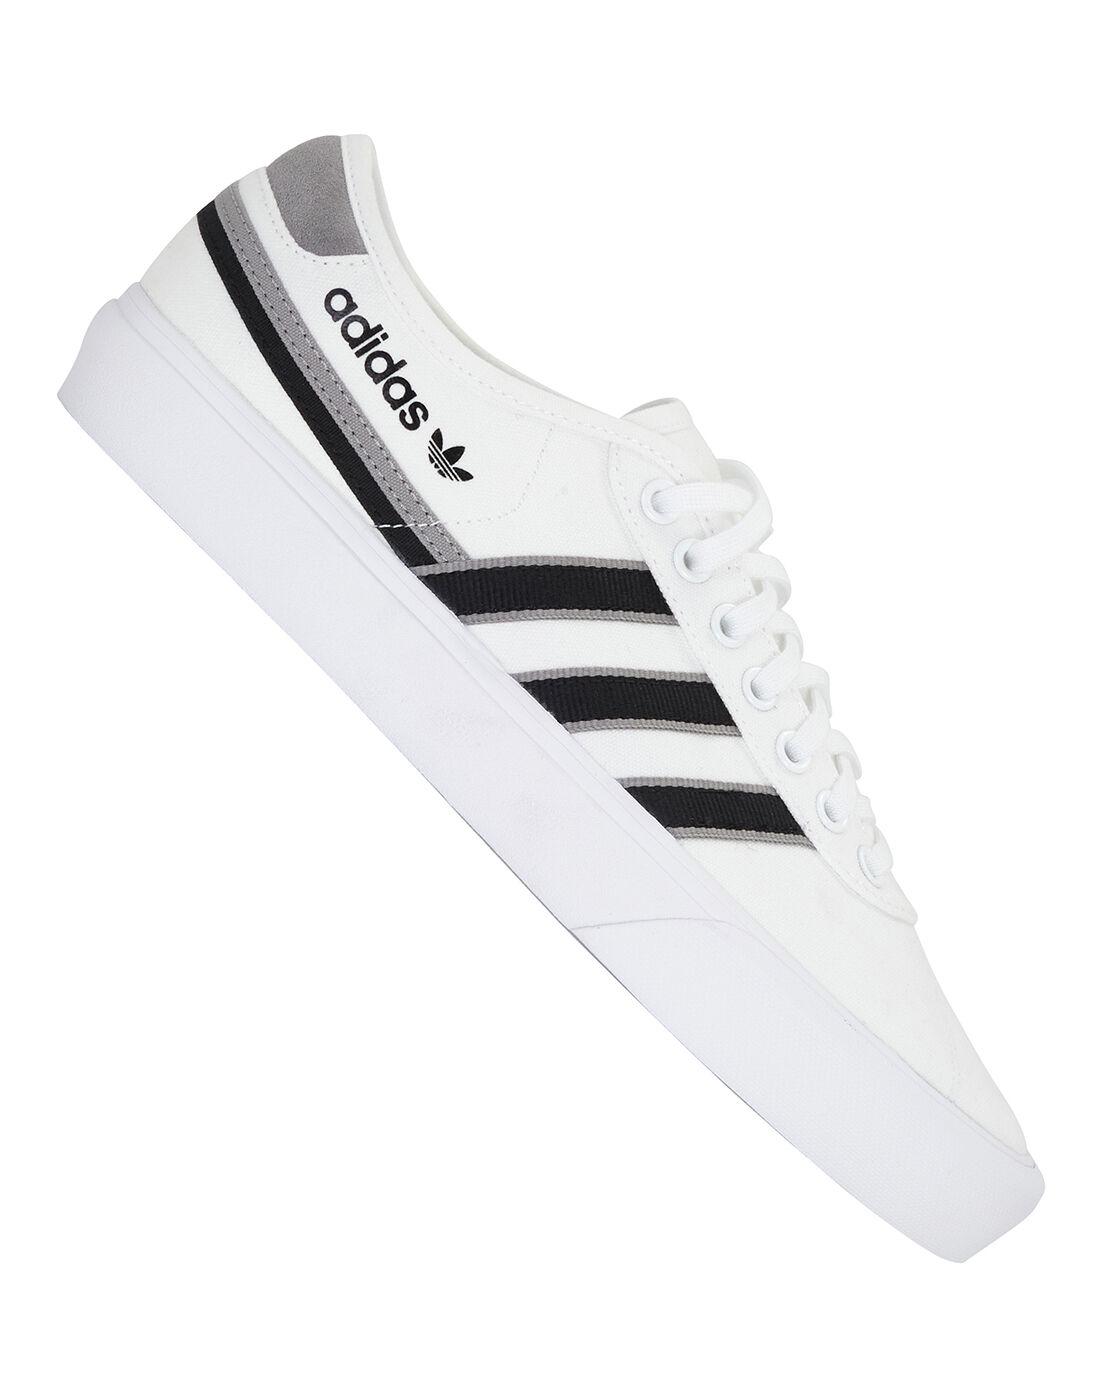 adidas Originals nmd pitch black being worn women shoes on sale | Mens Delpala